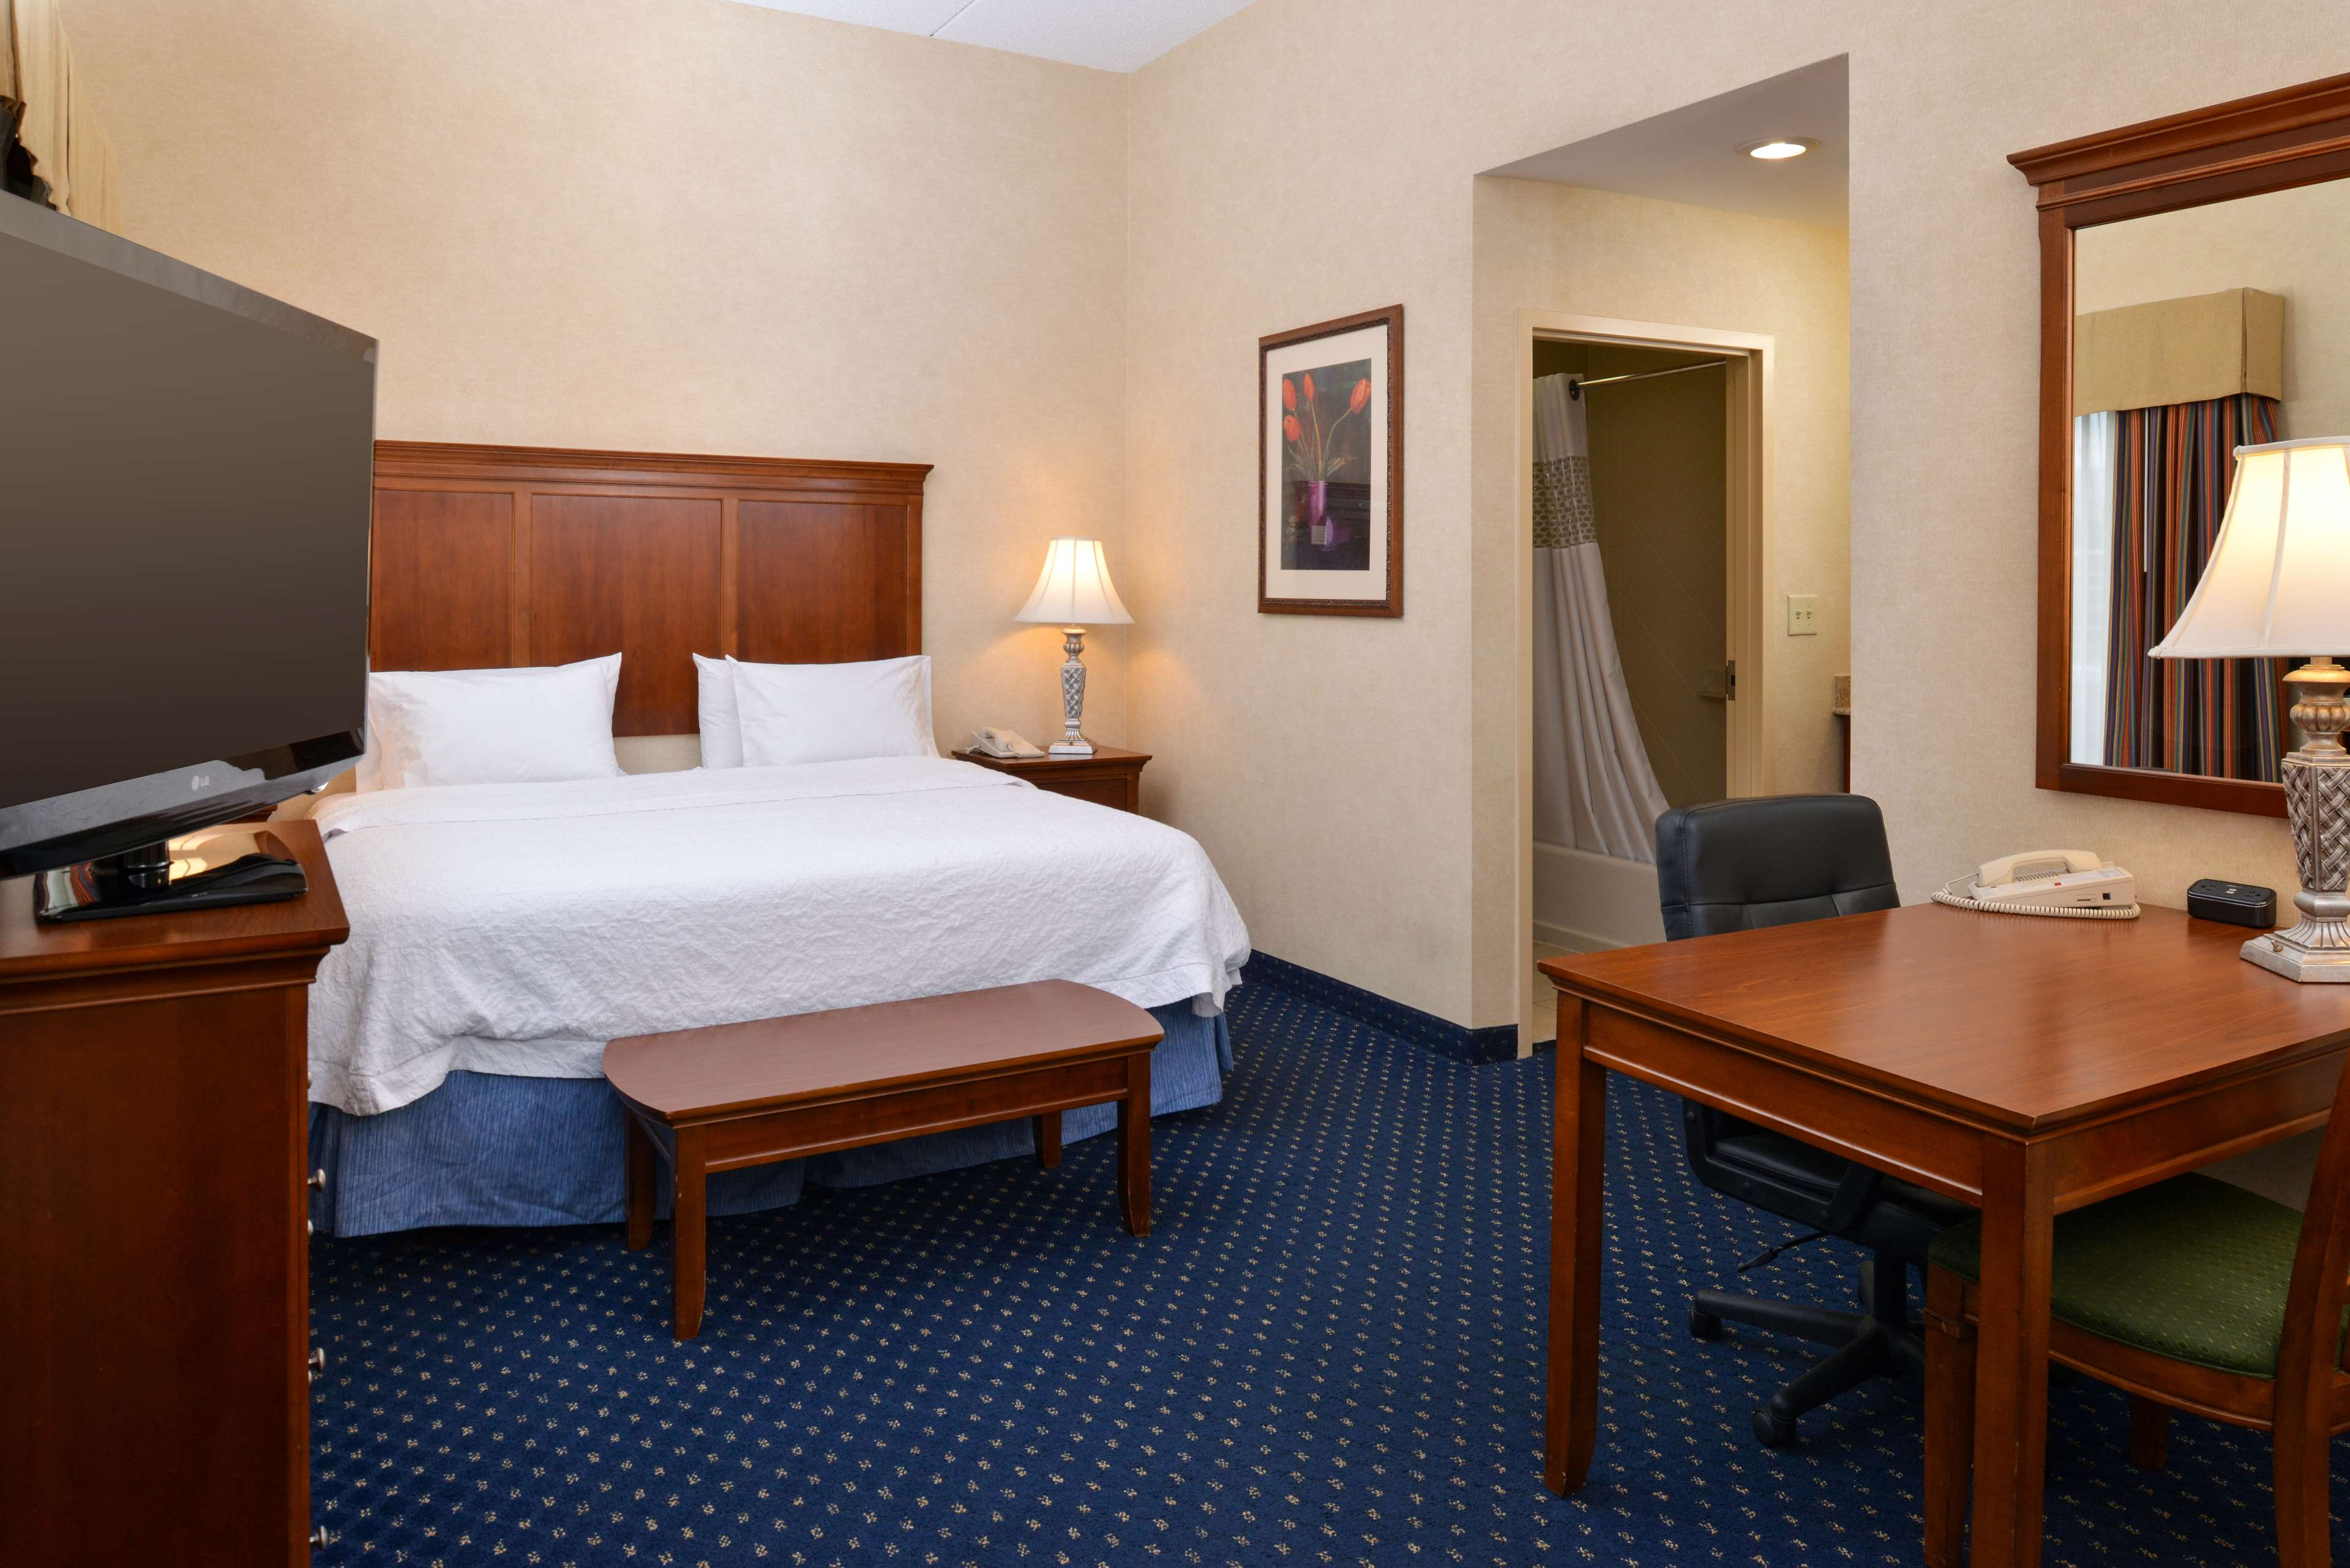 Hampton Inn & Suites Fredericksburg South image 31